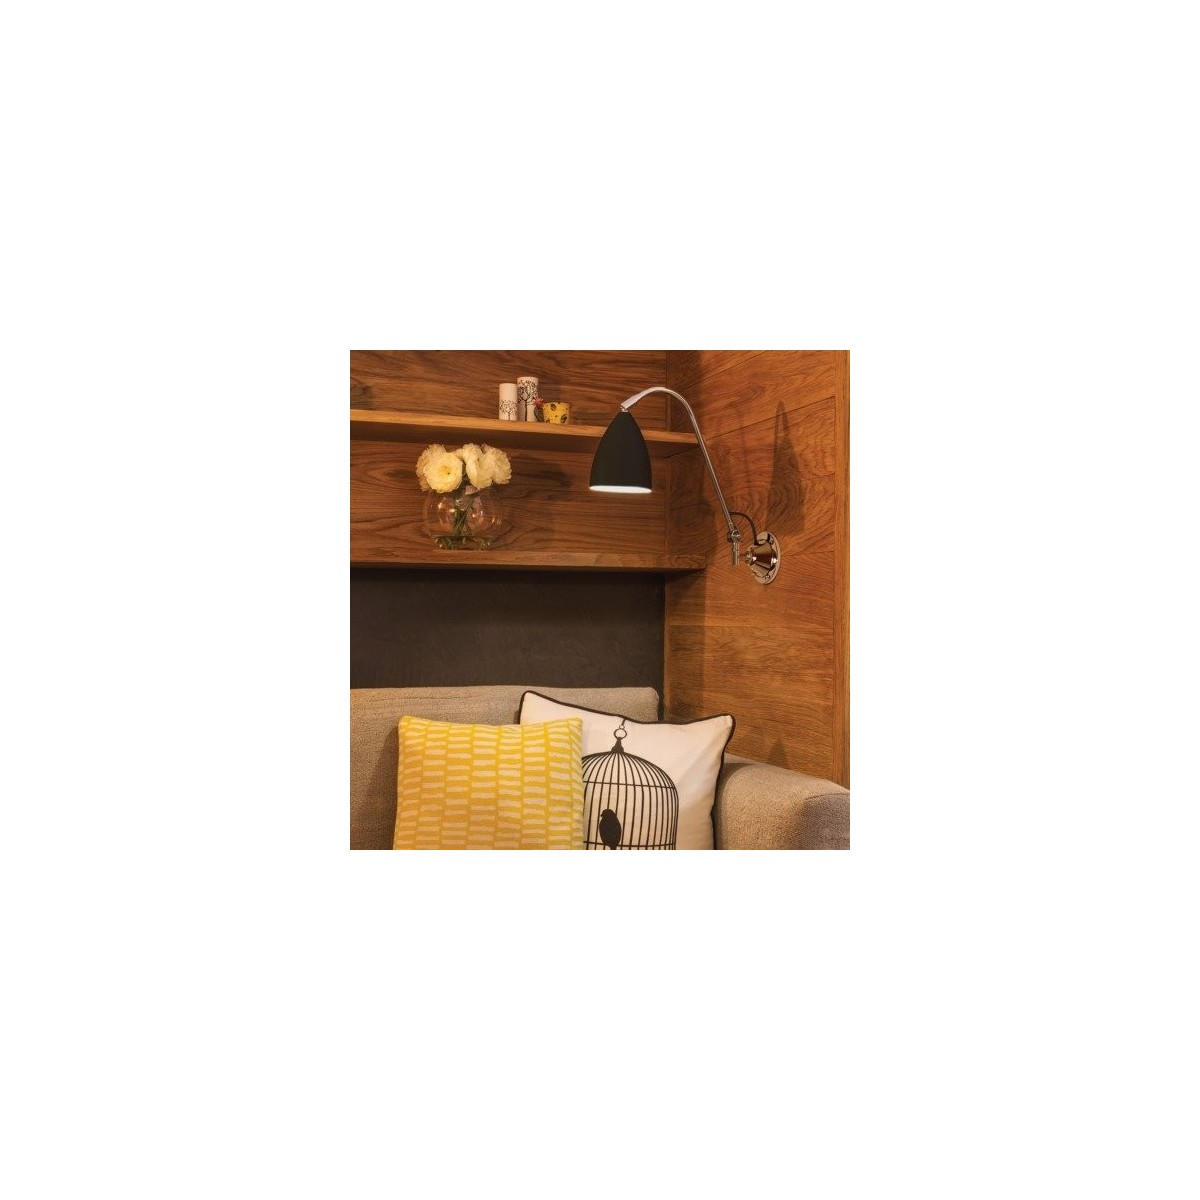 Astro Joel Grande Wall Do Czytania 1x42W Max E27 Czarny Mat 1223022